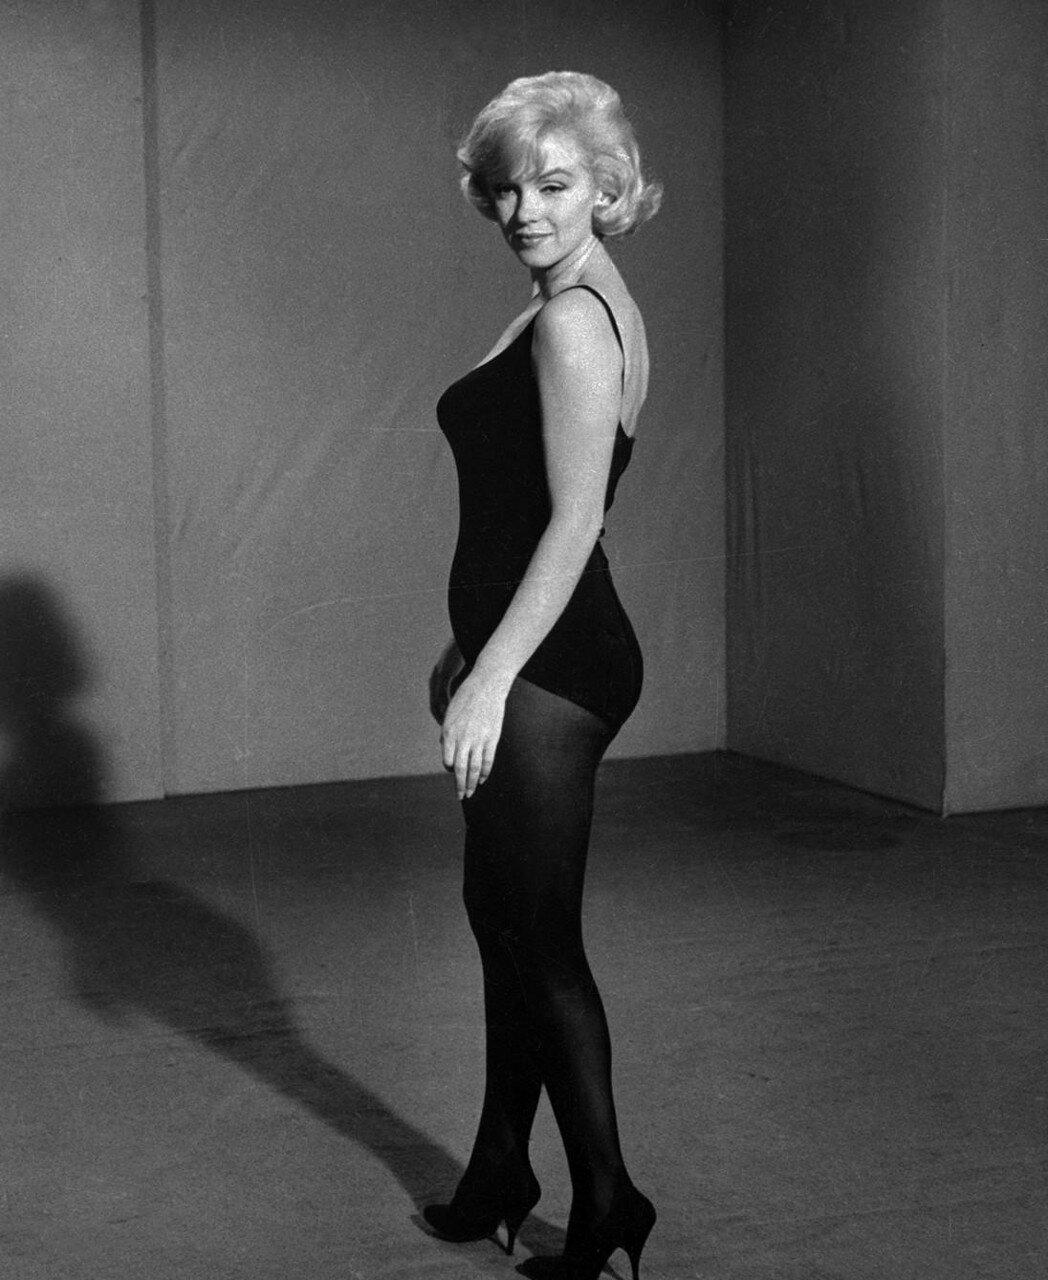 Marilyn Monroe Standing in Profile Pose